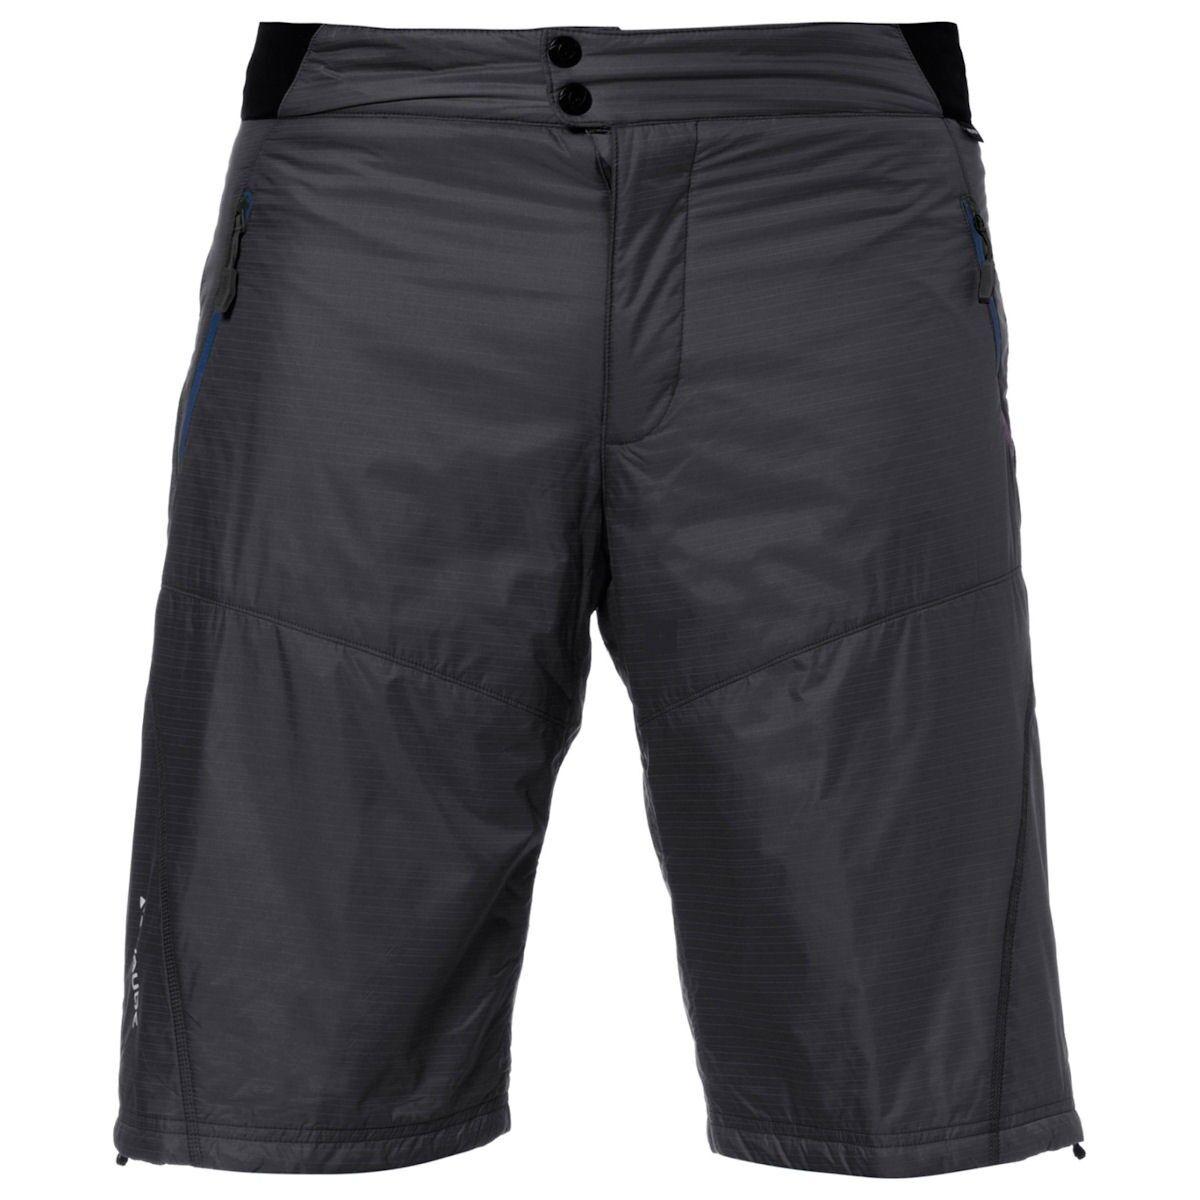 Vaude Waddington Shorts II Primaloft funzione Pantaloncini Nero